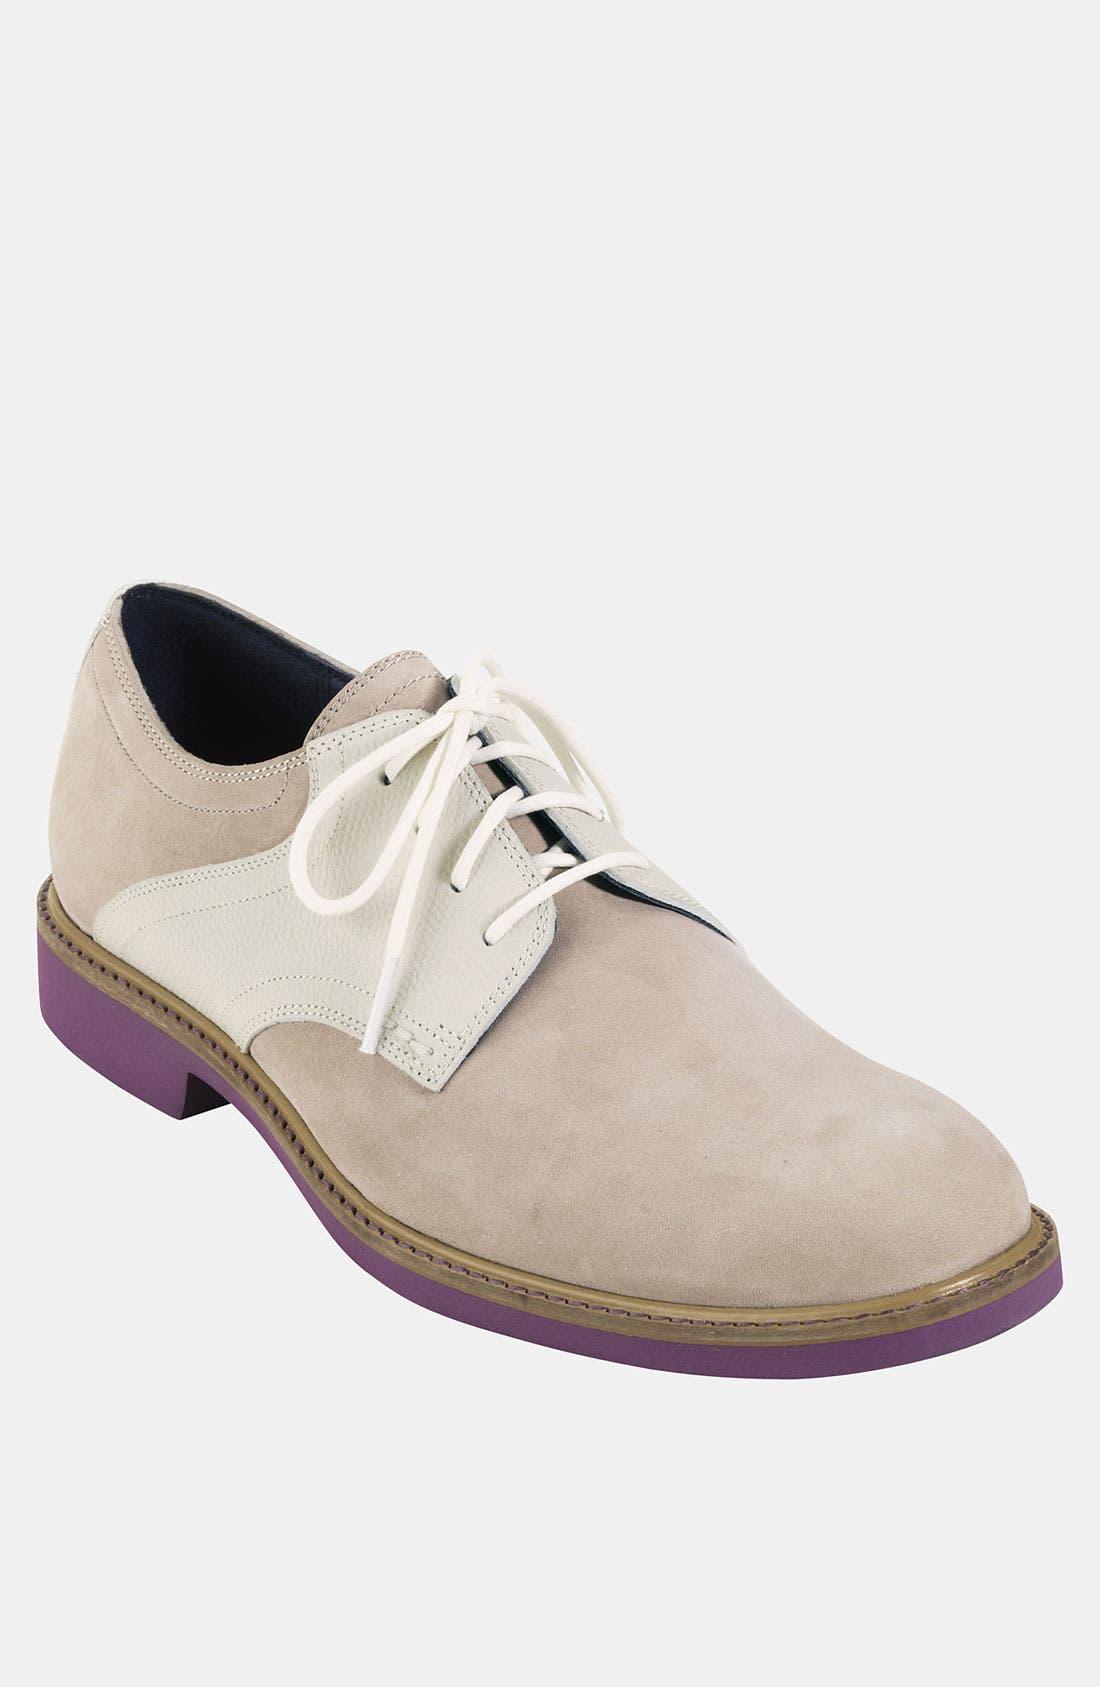 Main Image - Cole Haan 'Great Jones' Saddle Shoe